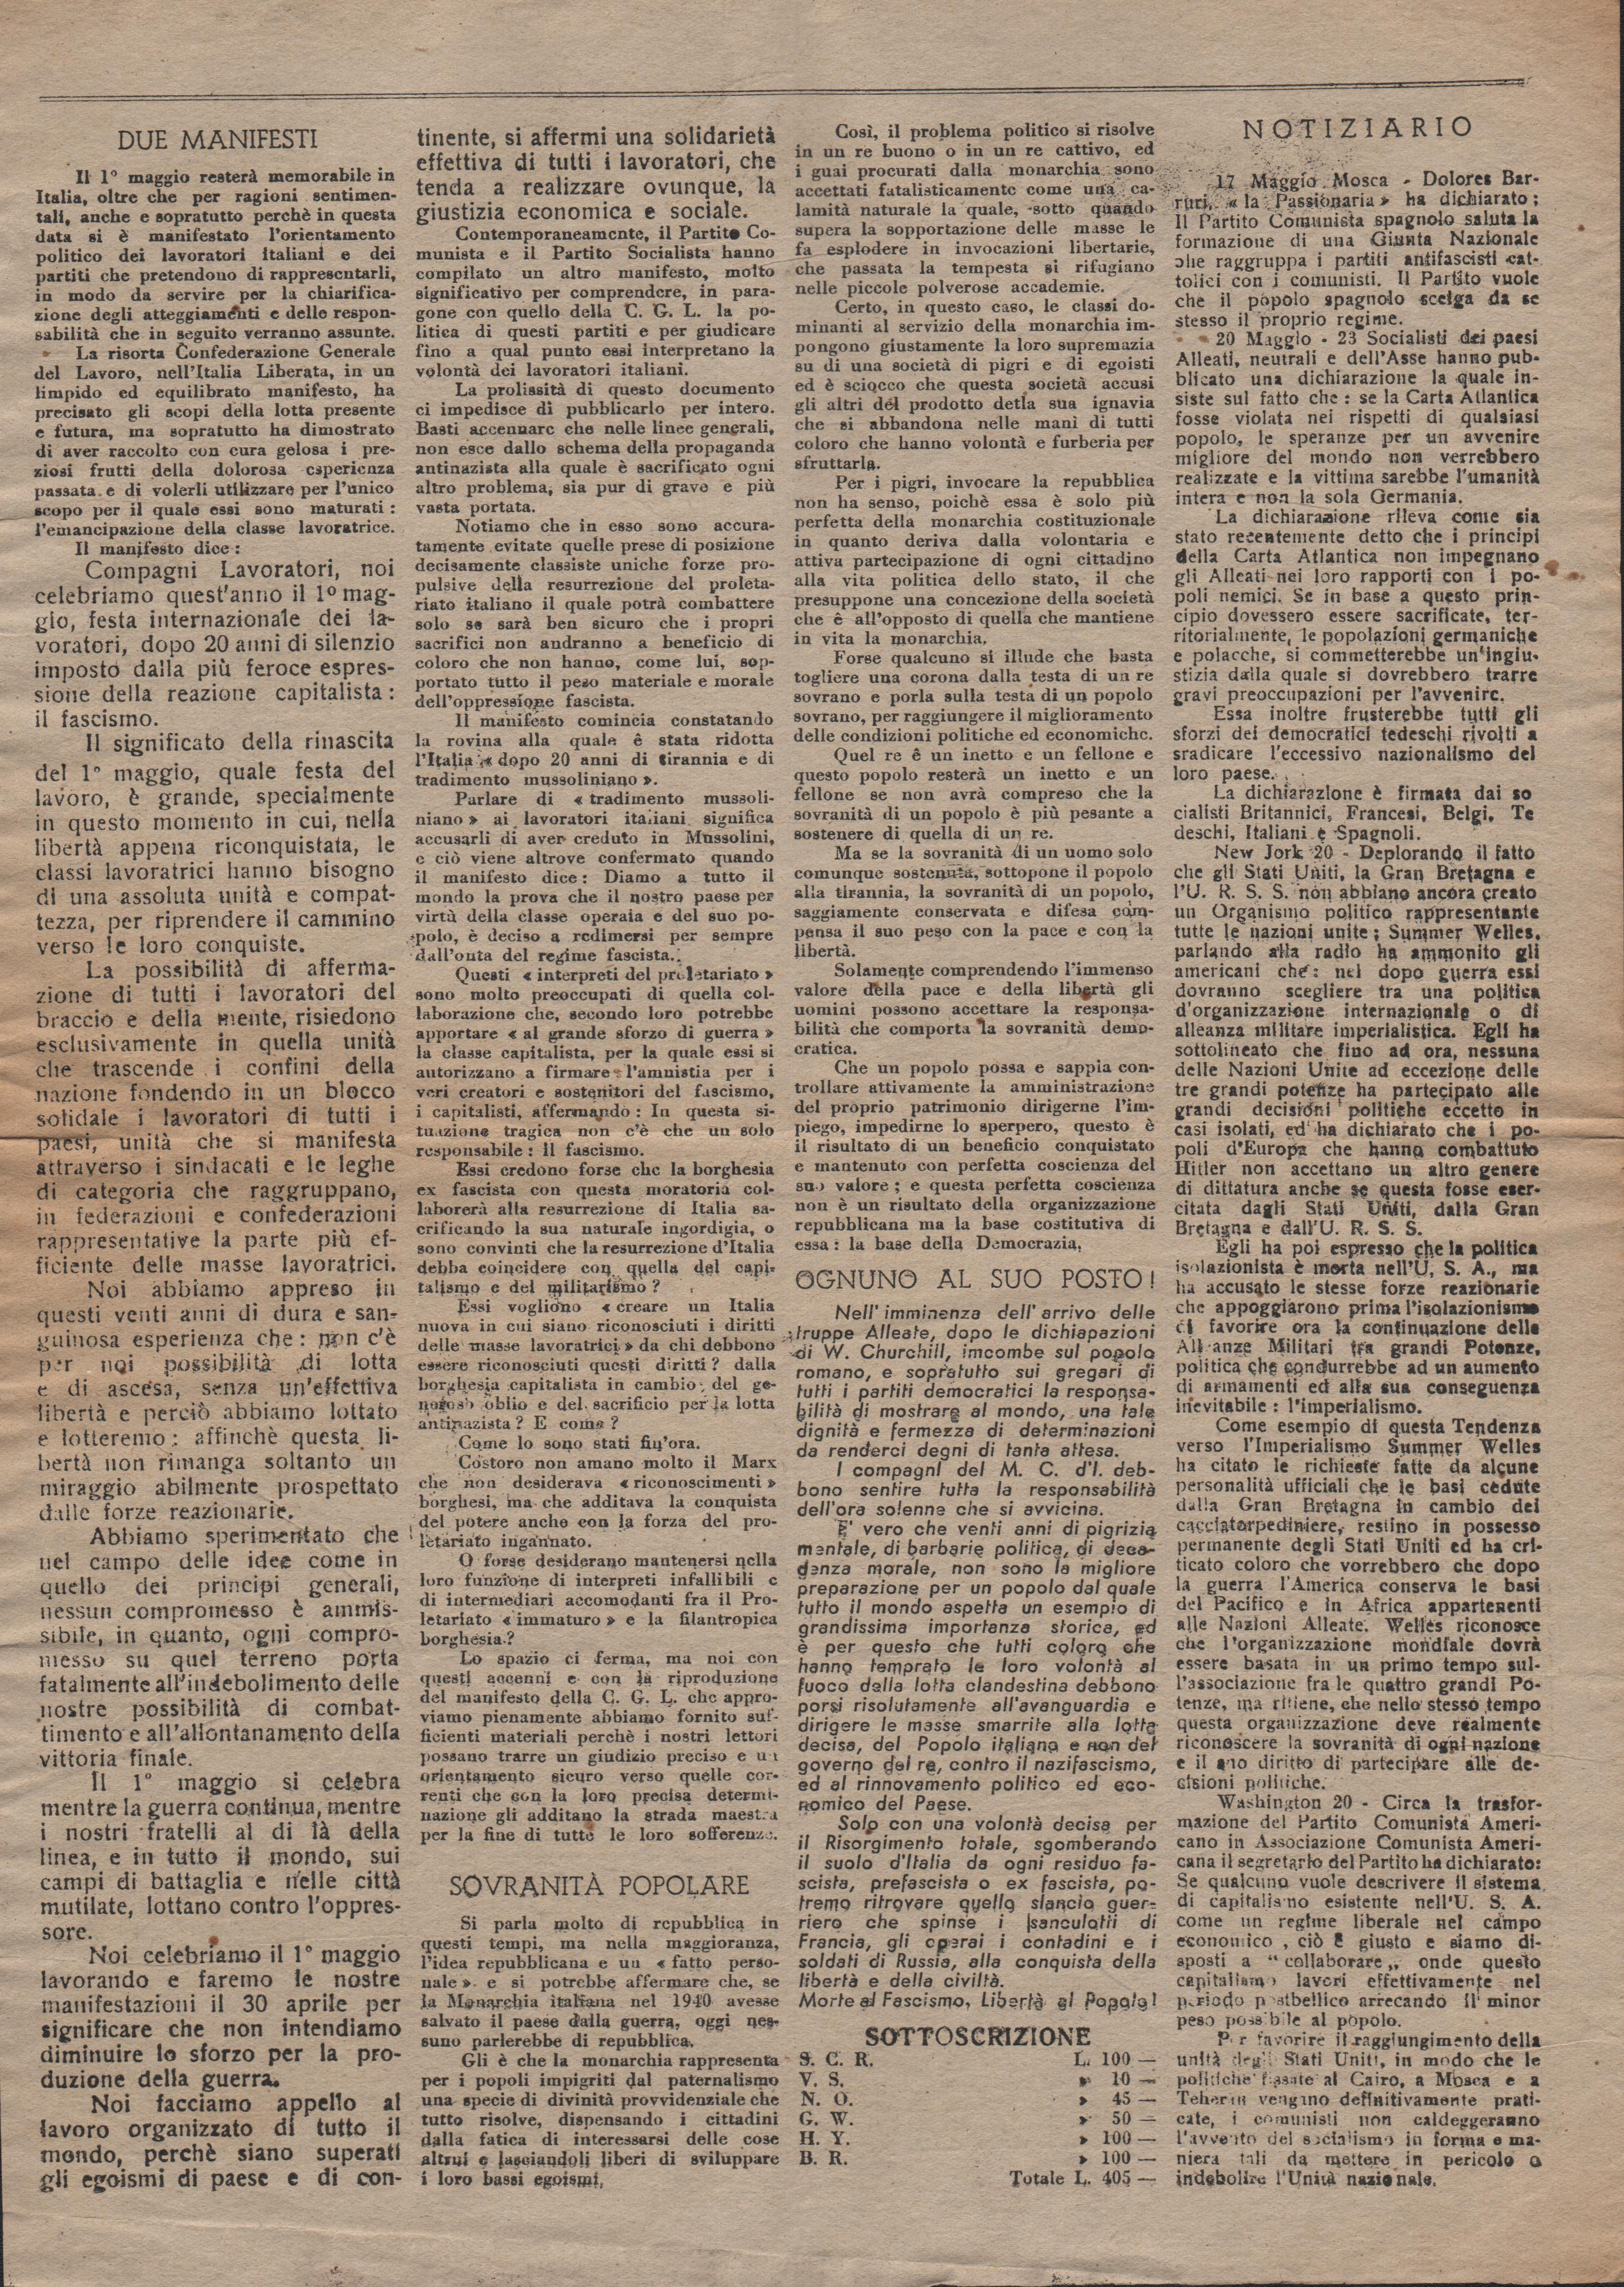 Bandiera Rossa n.10 (10 giugno 1944) - pag. 2